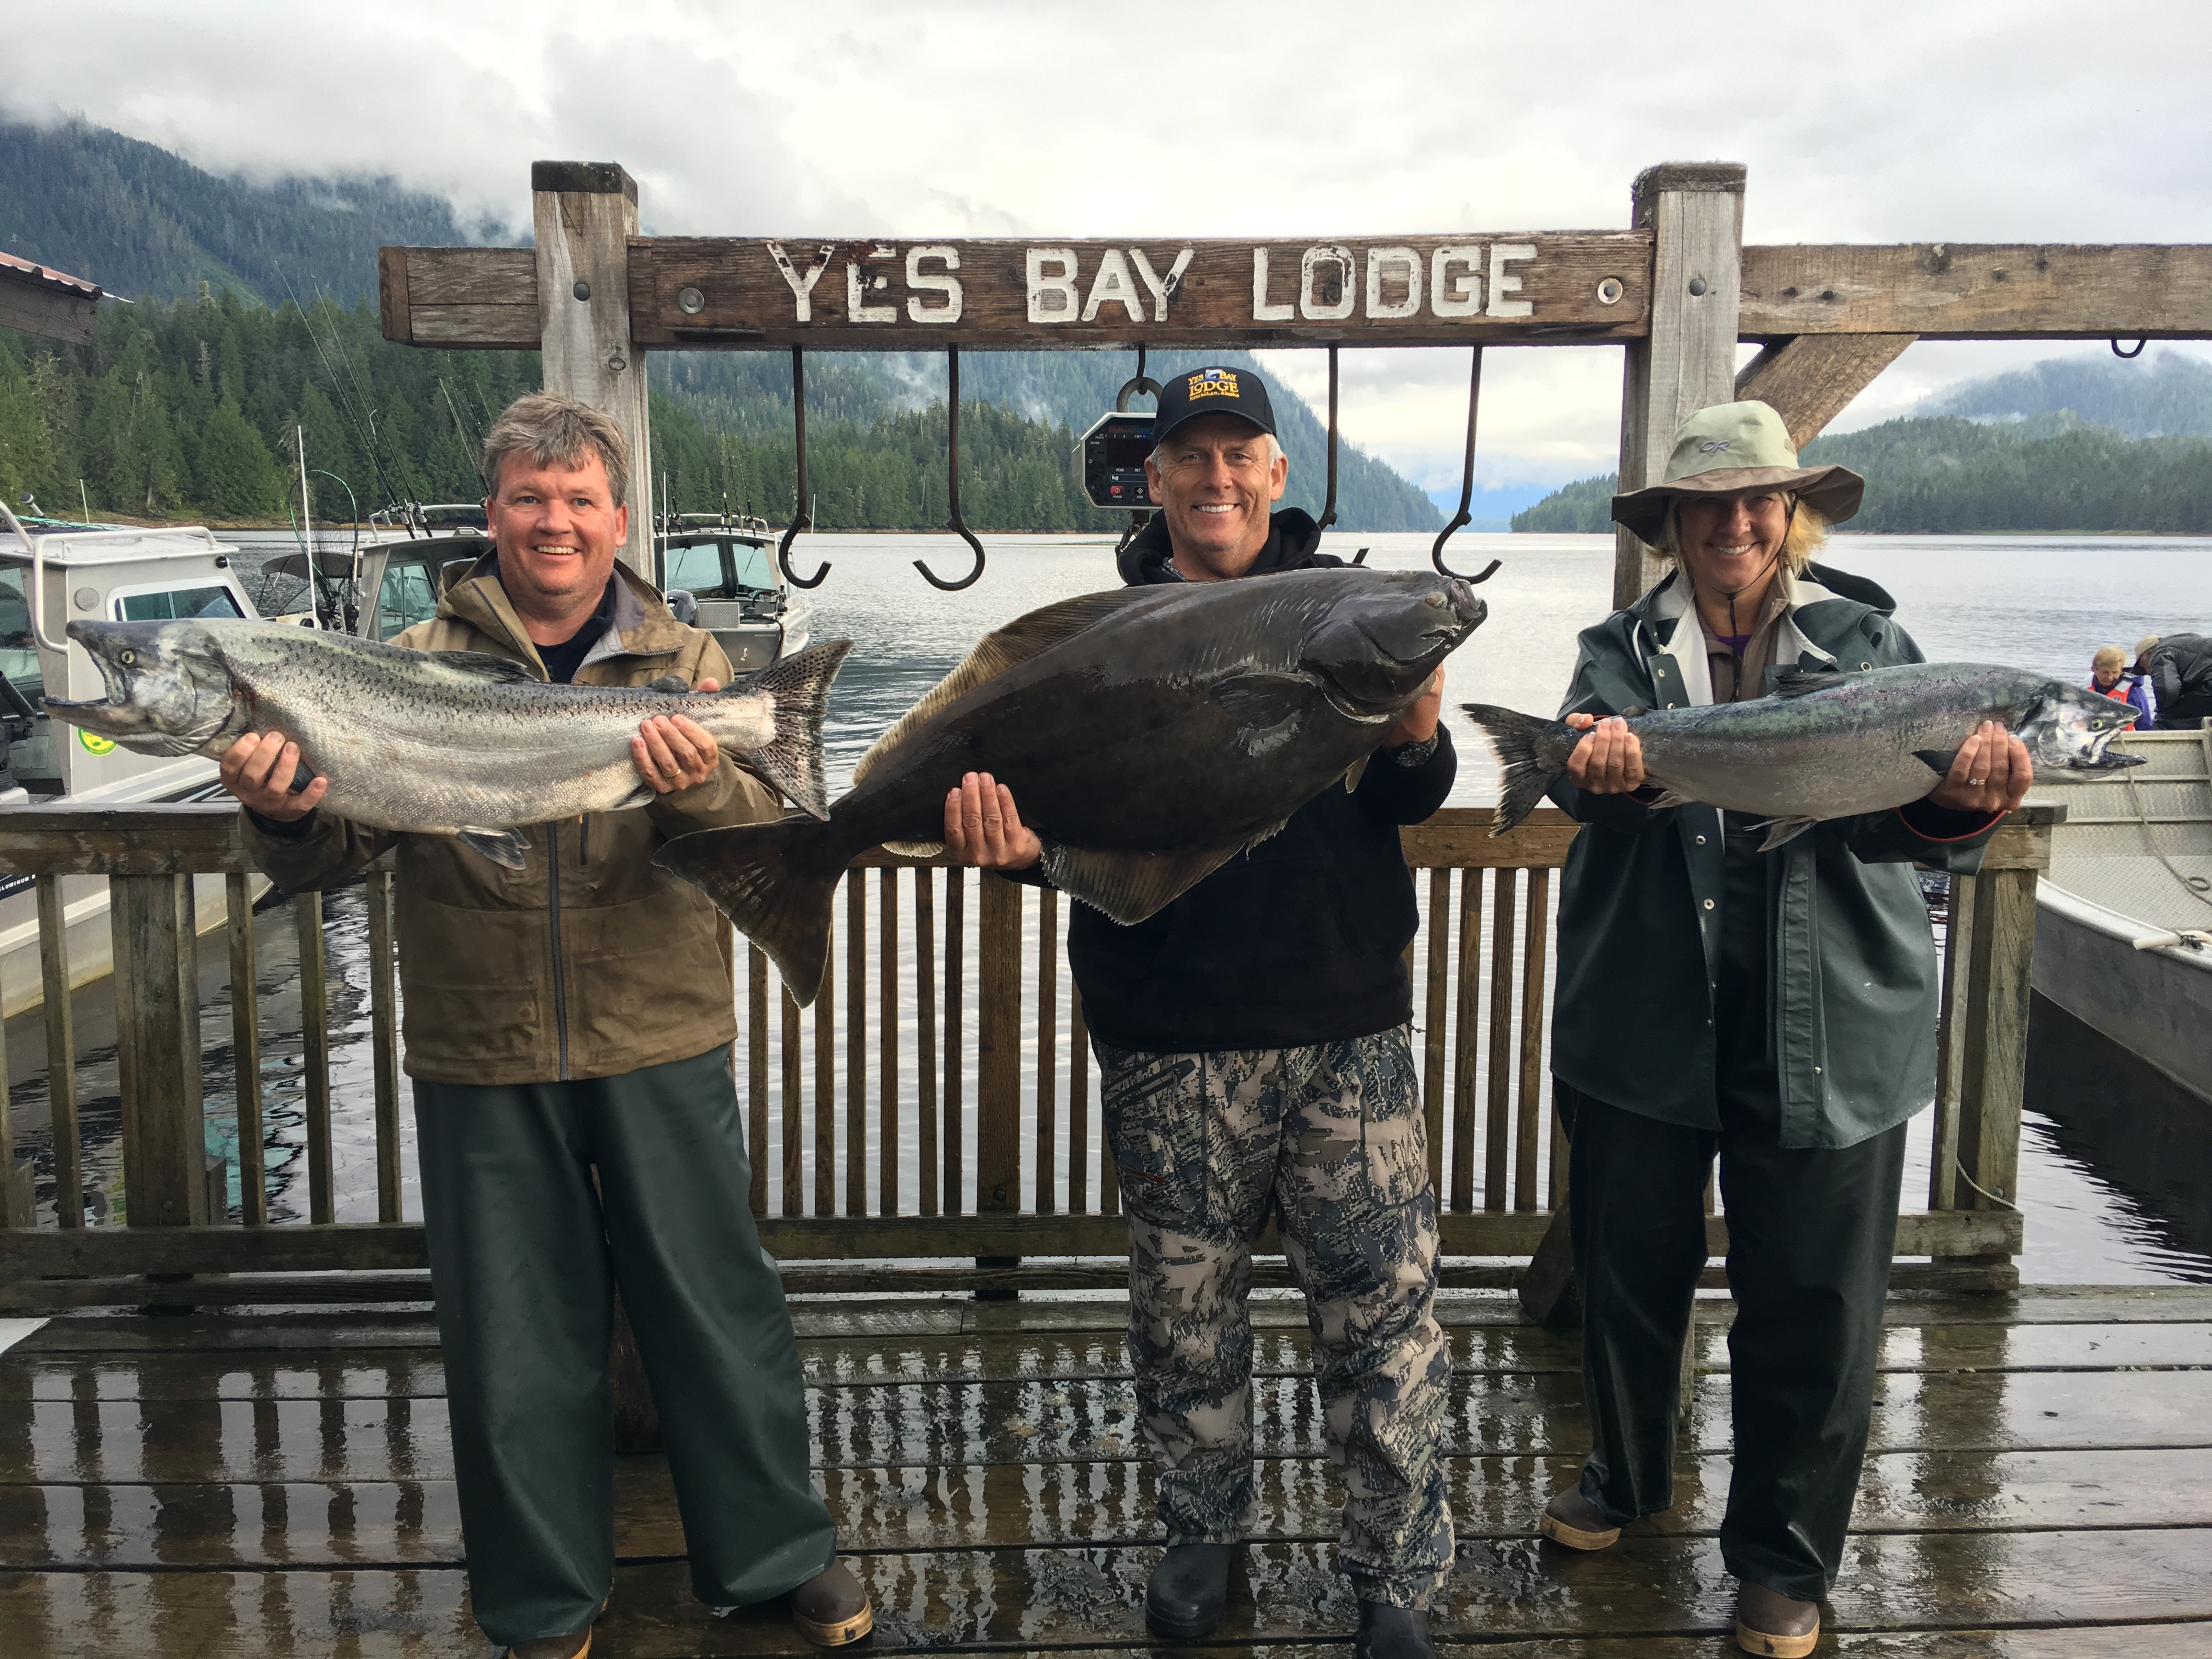 June 17: Outdoorsman's Attic – Yes Bay Lodge Alaska Fishing – Elk Calling